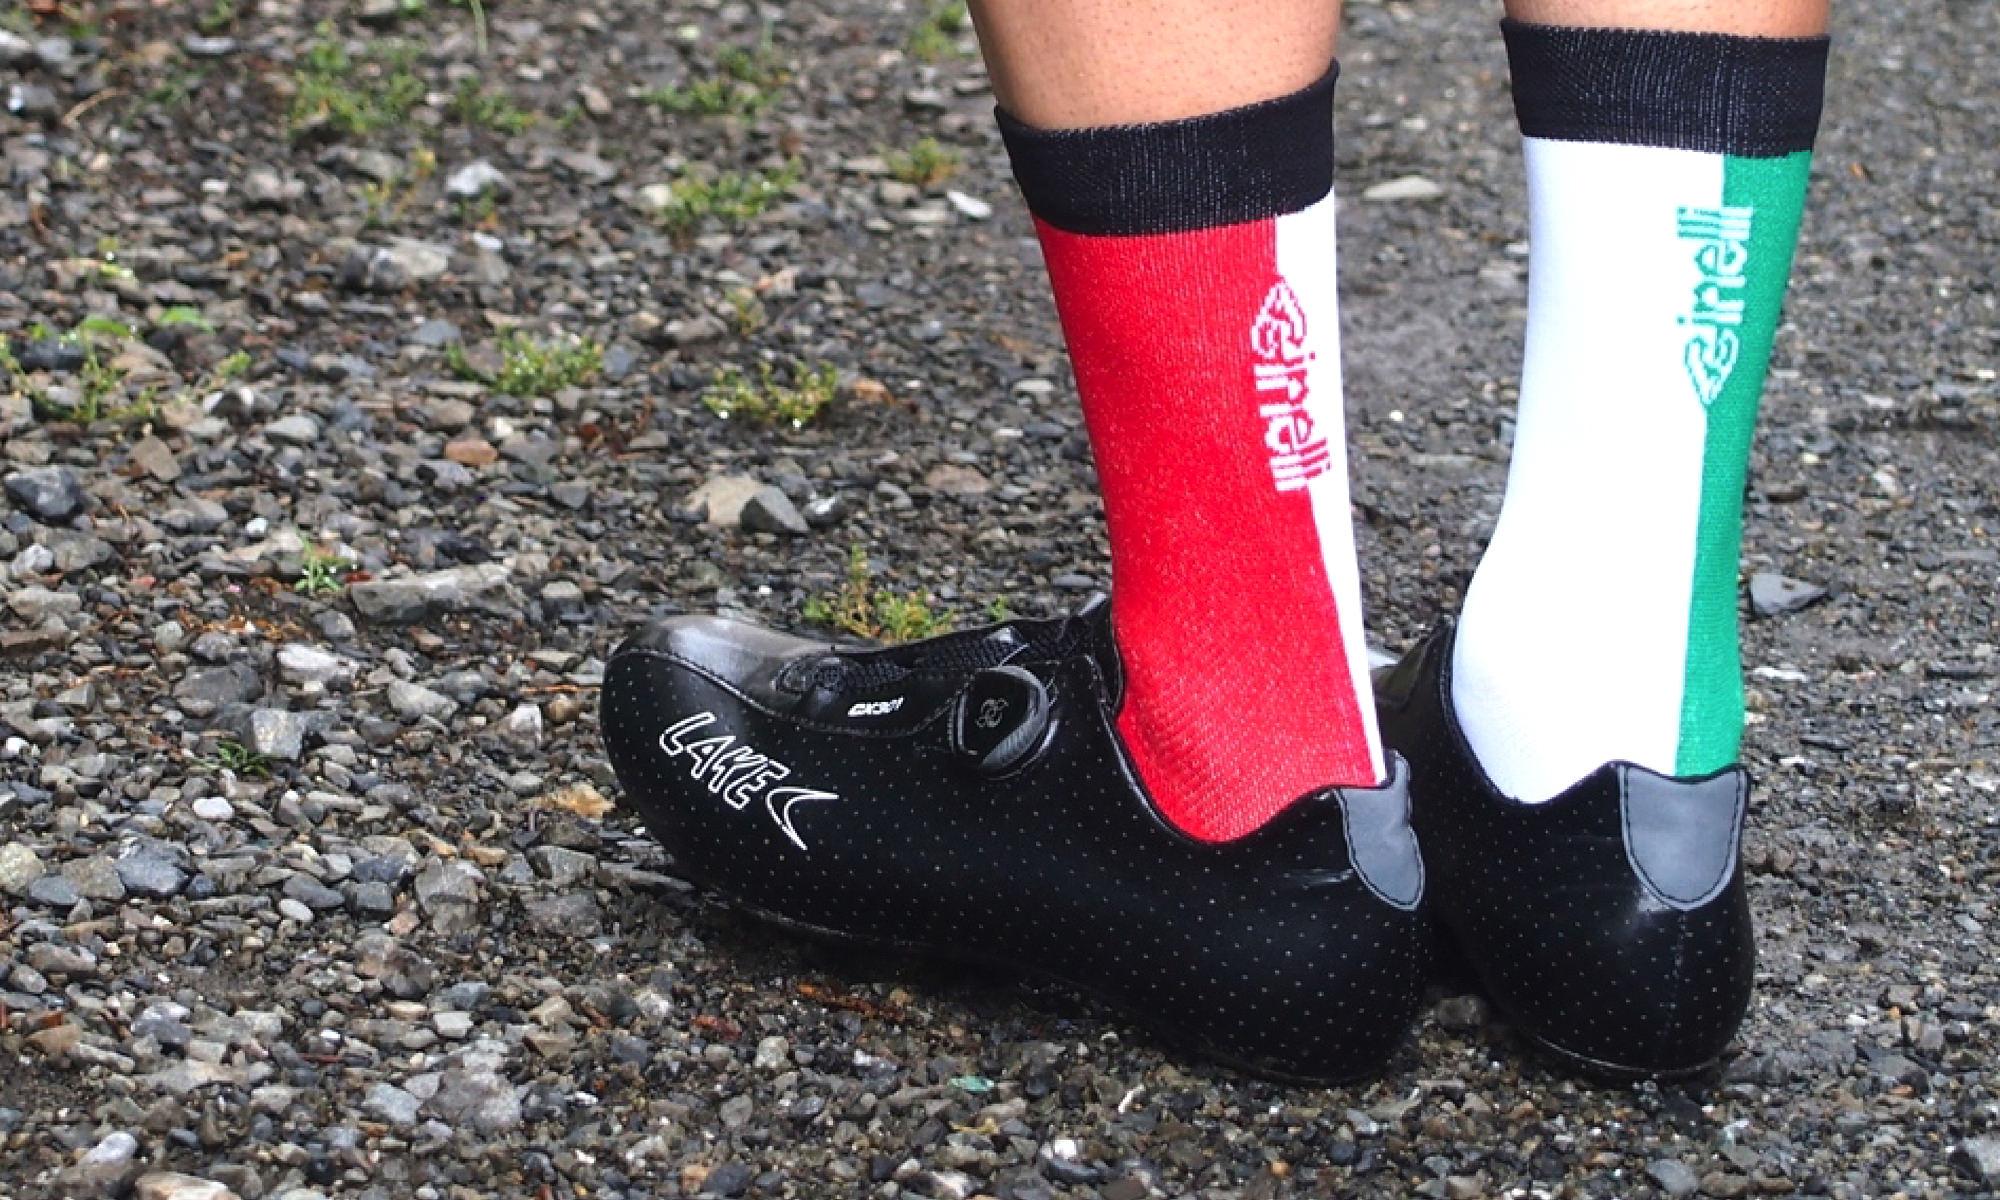 The Wonderful Socks Cinelli rear